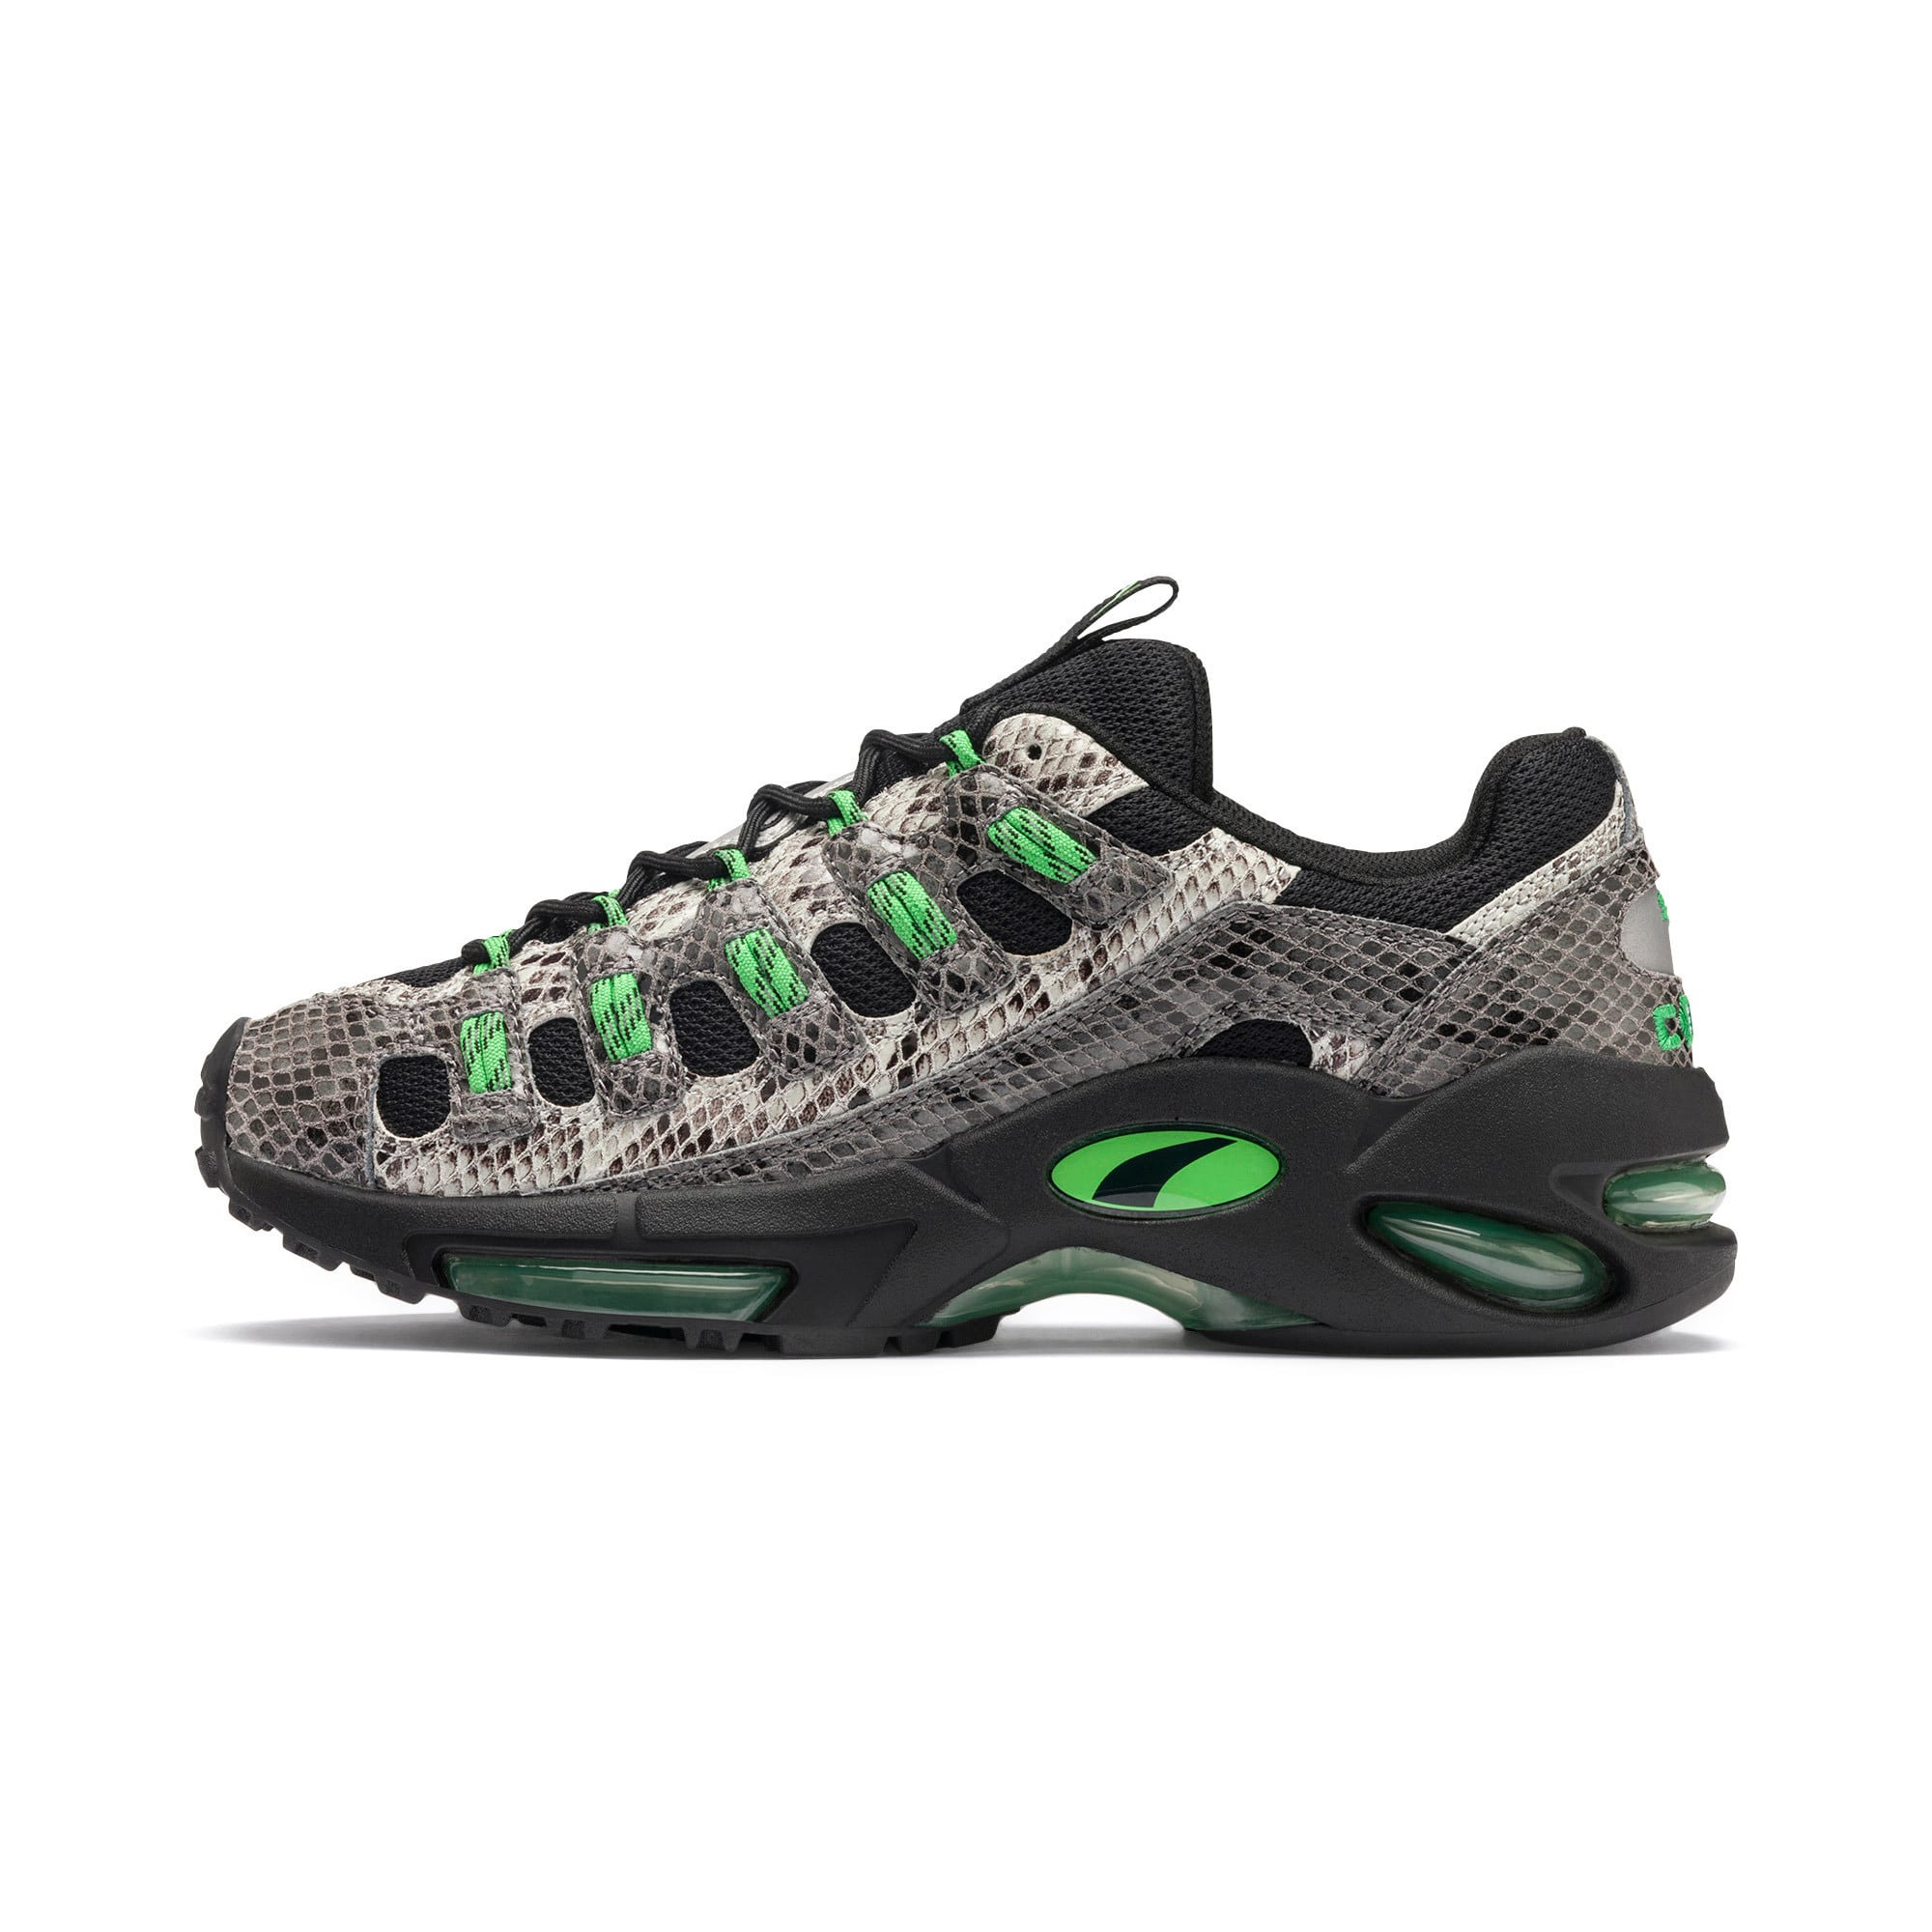 Thumbnail 1 of CELL Endura Animal Kingdom Sneakers, Puma Black-Classic Green, medium